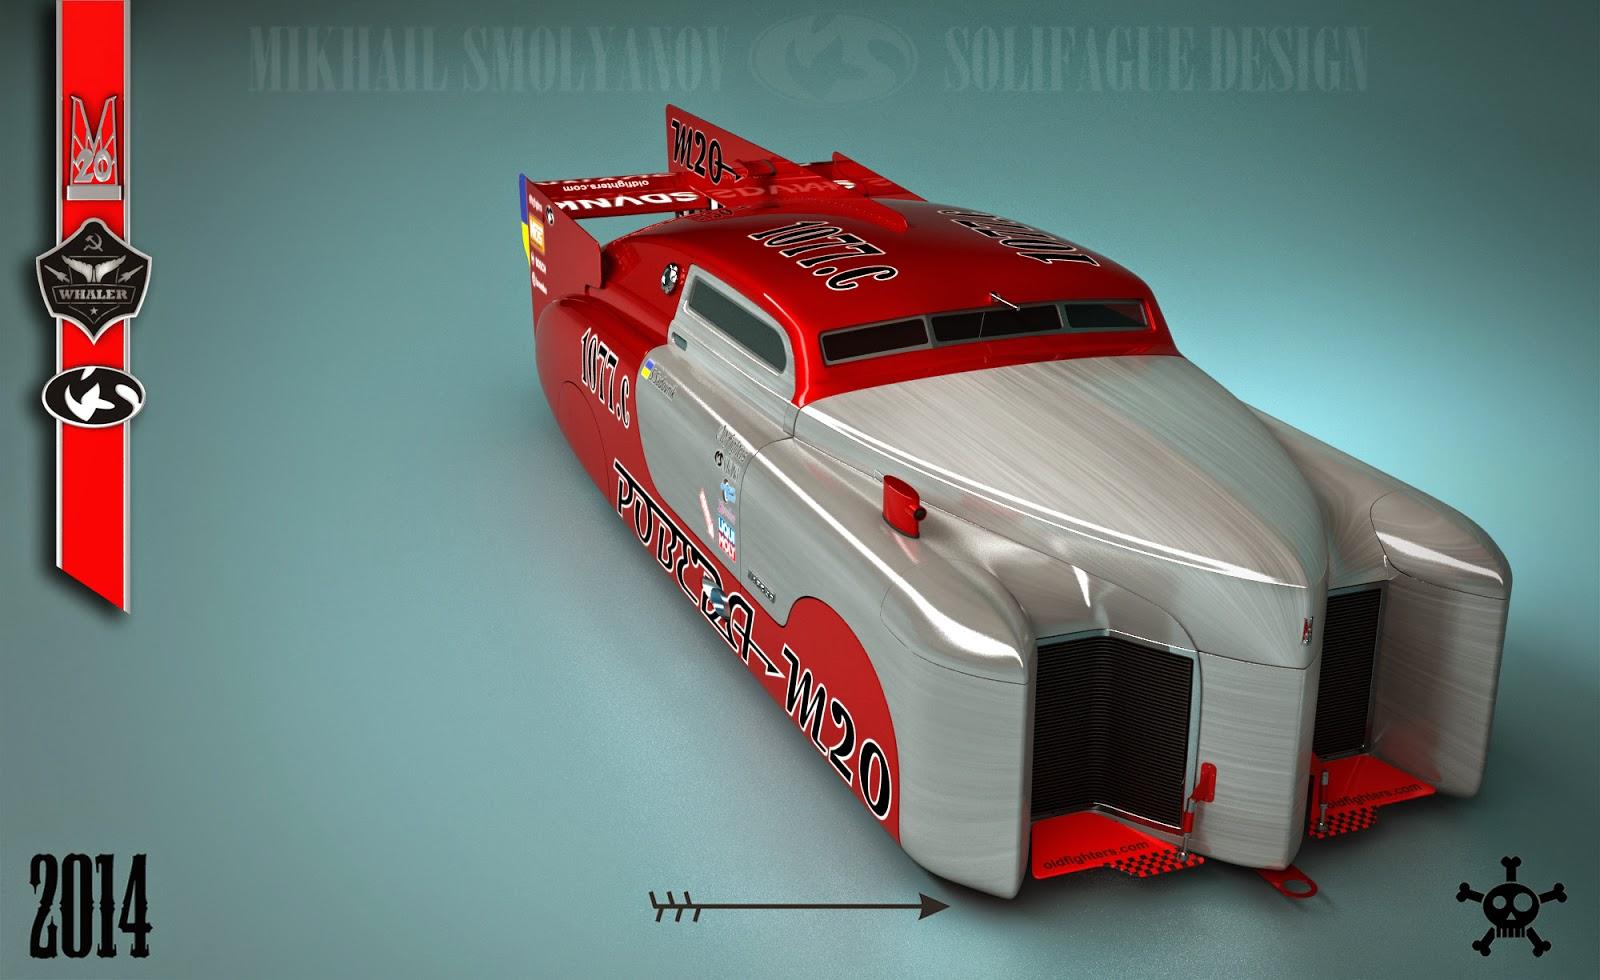 Soviet M Pobeda Redesigned To Race At Bonneville Salt Flats Photo Gallery